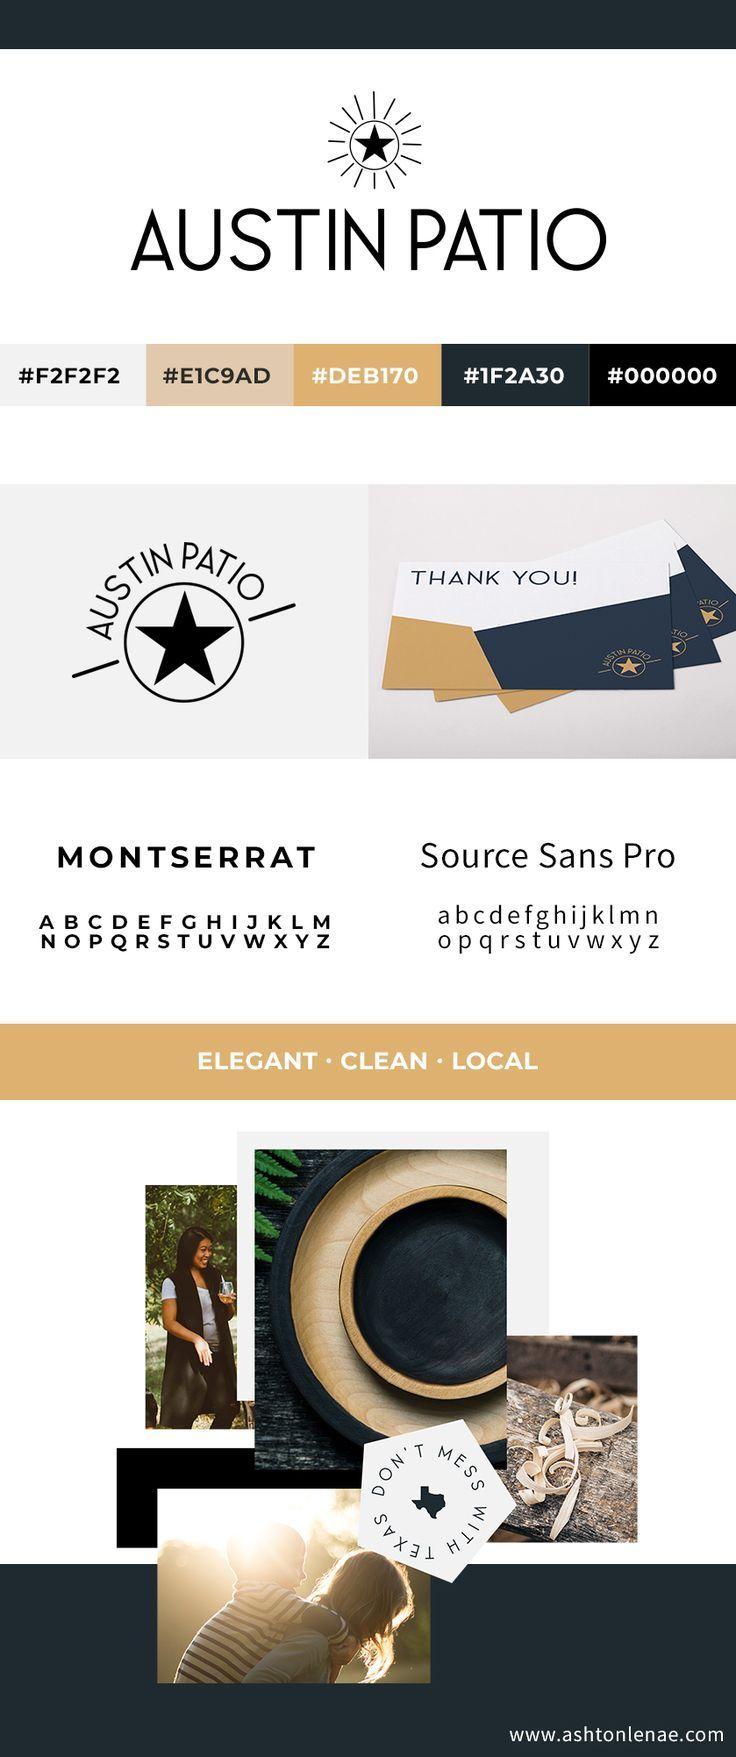 Brand Identity And Website Design For Austin Patio Local Texas Design Inspiration Star Logo In 2020 Branding Design Inspiration Website Design Elegant Website Design